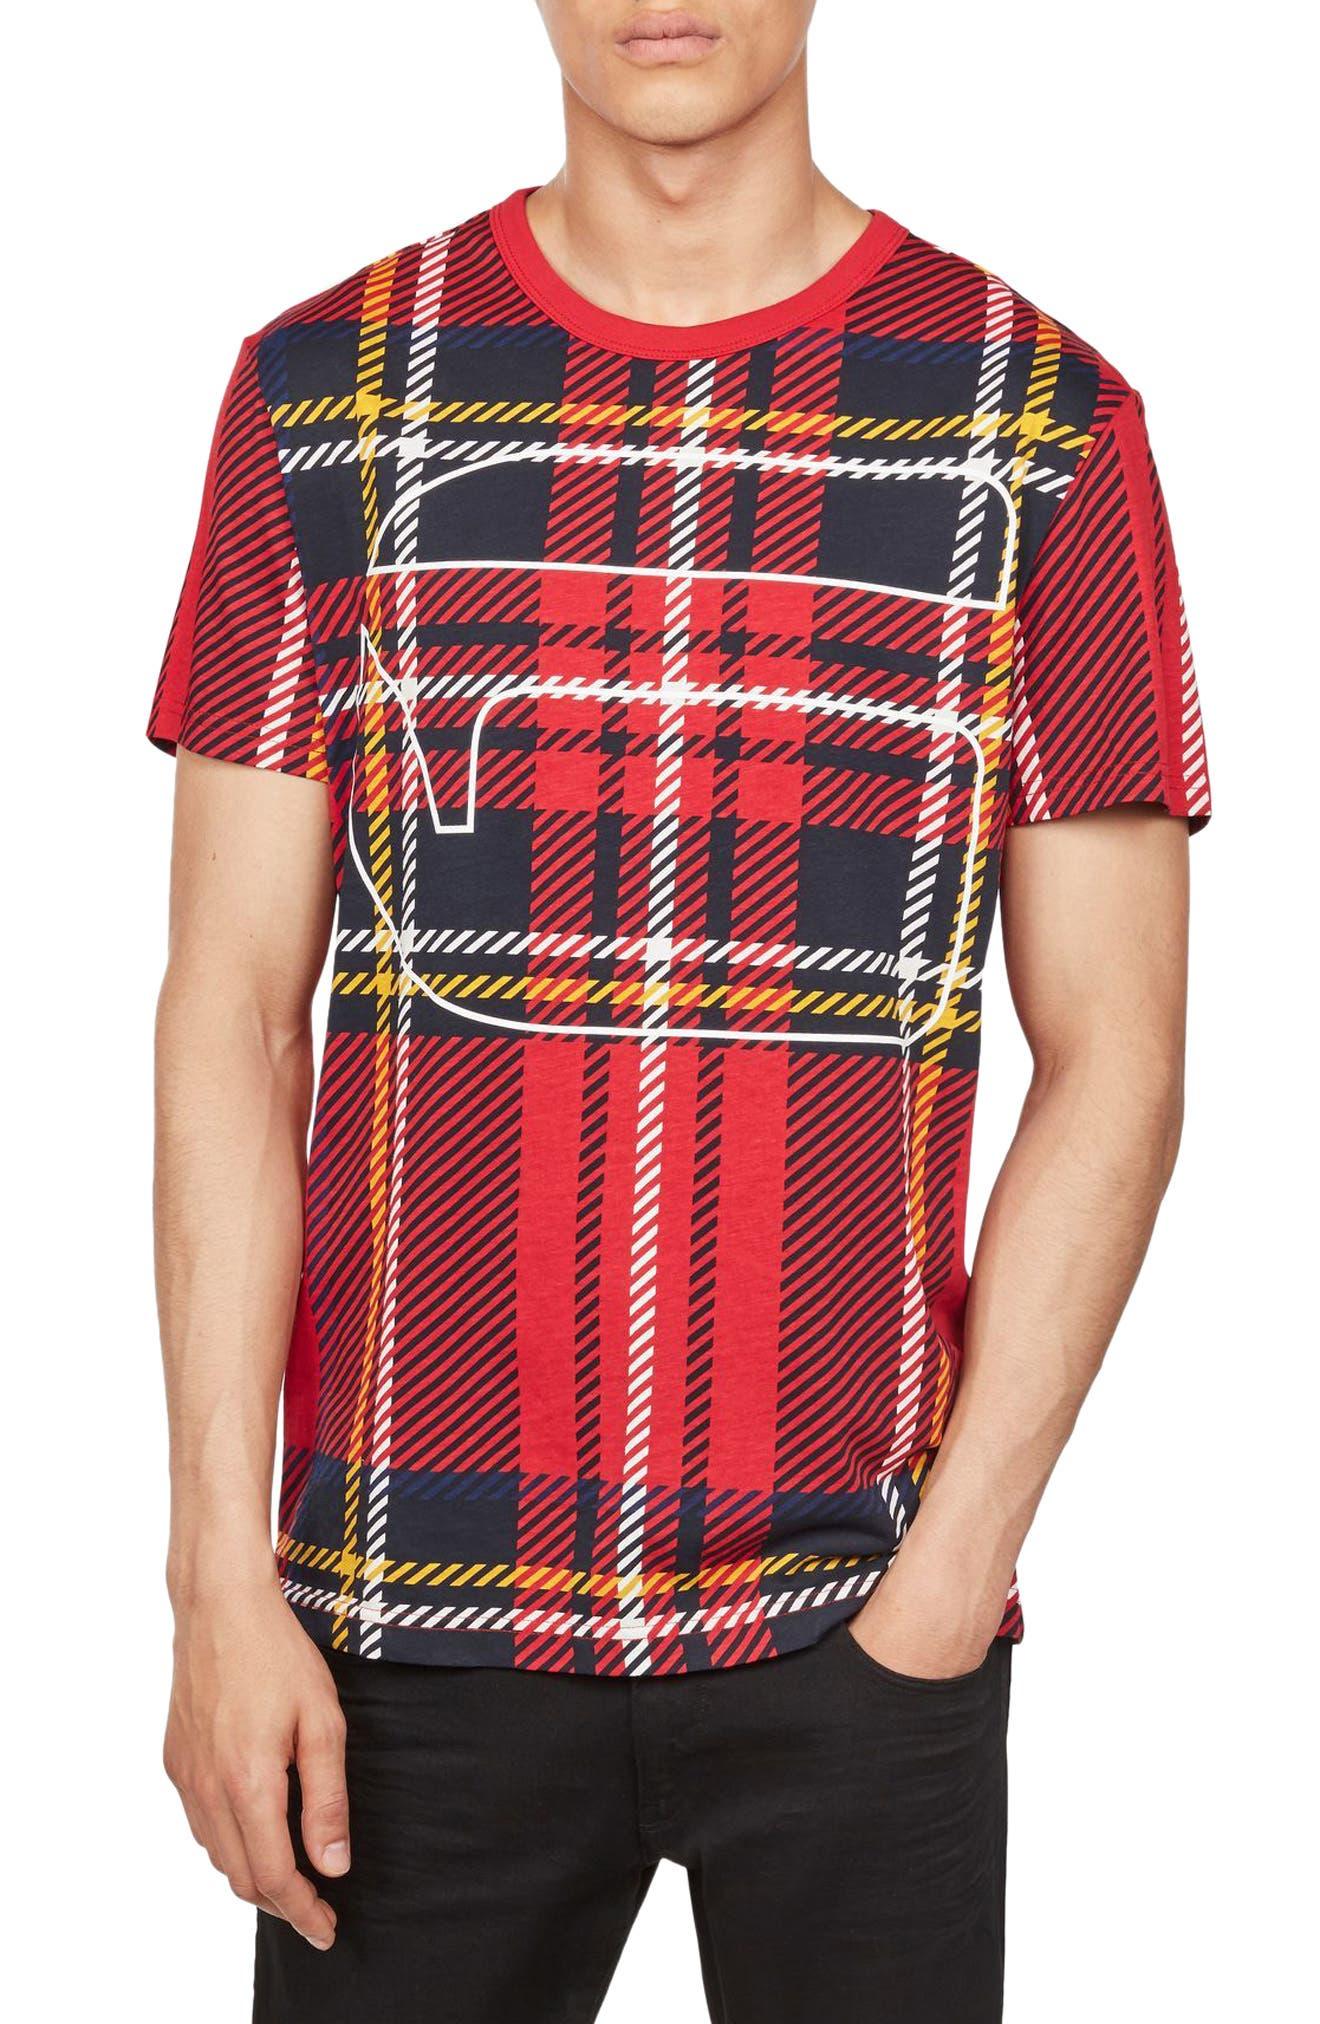 Alternate Image 1 Selected - G-Star Raw Royal Tartan Graphic T-Shirt